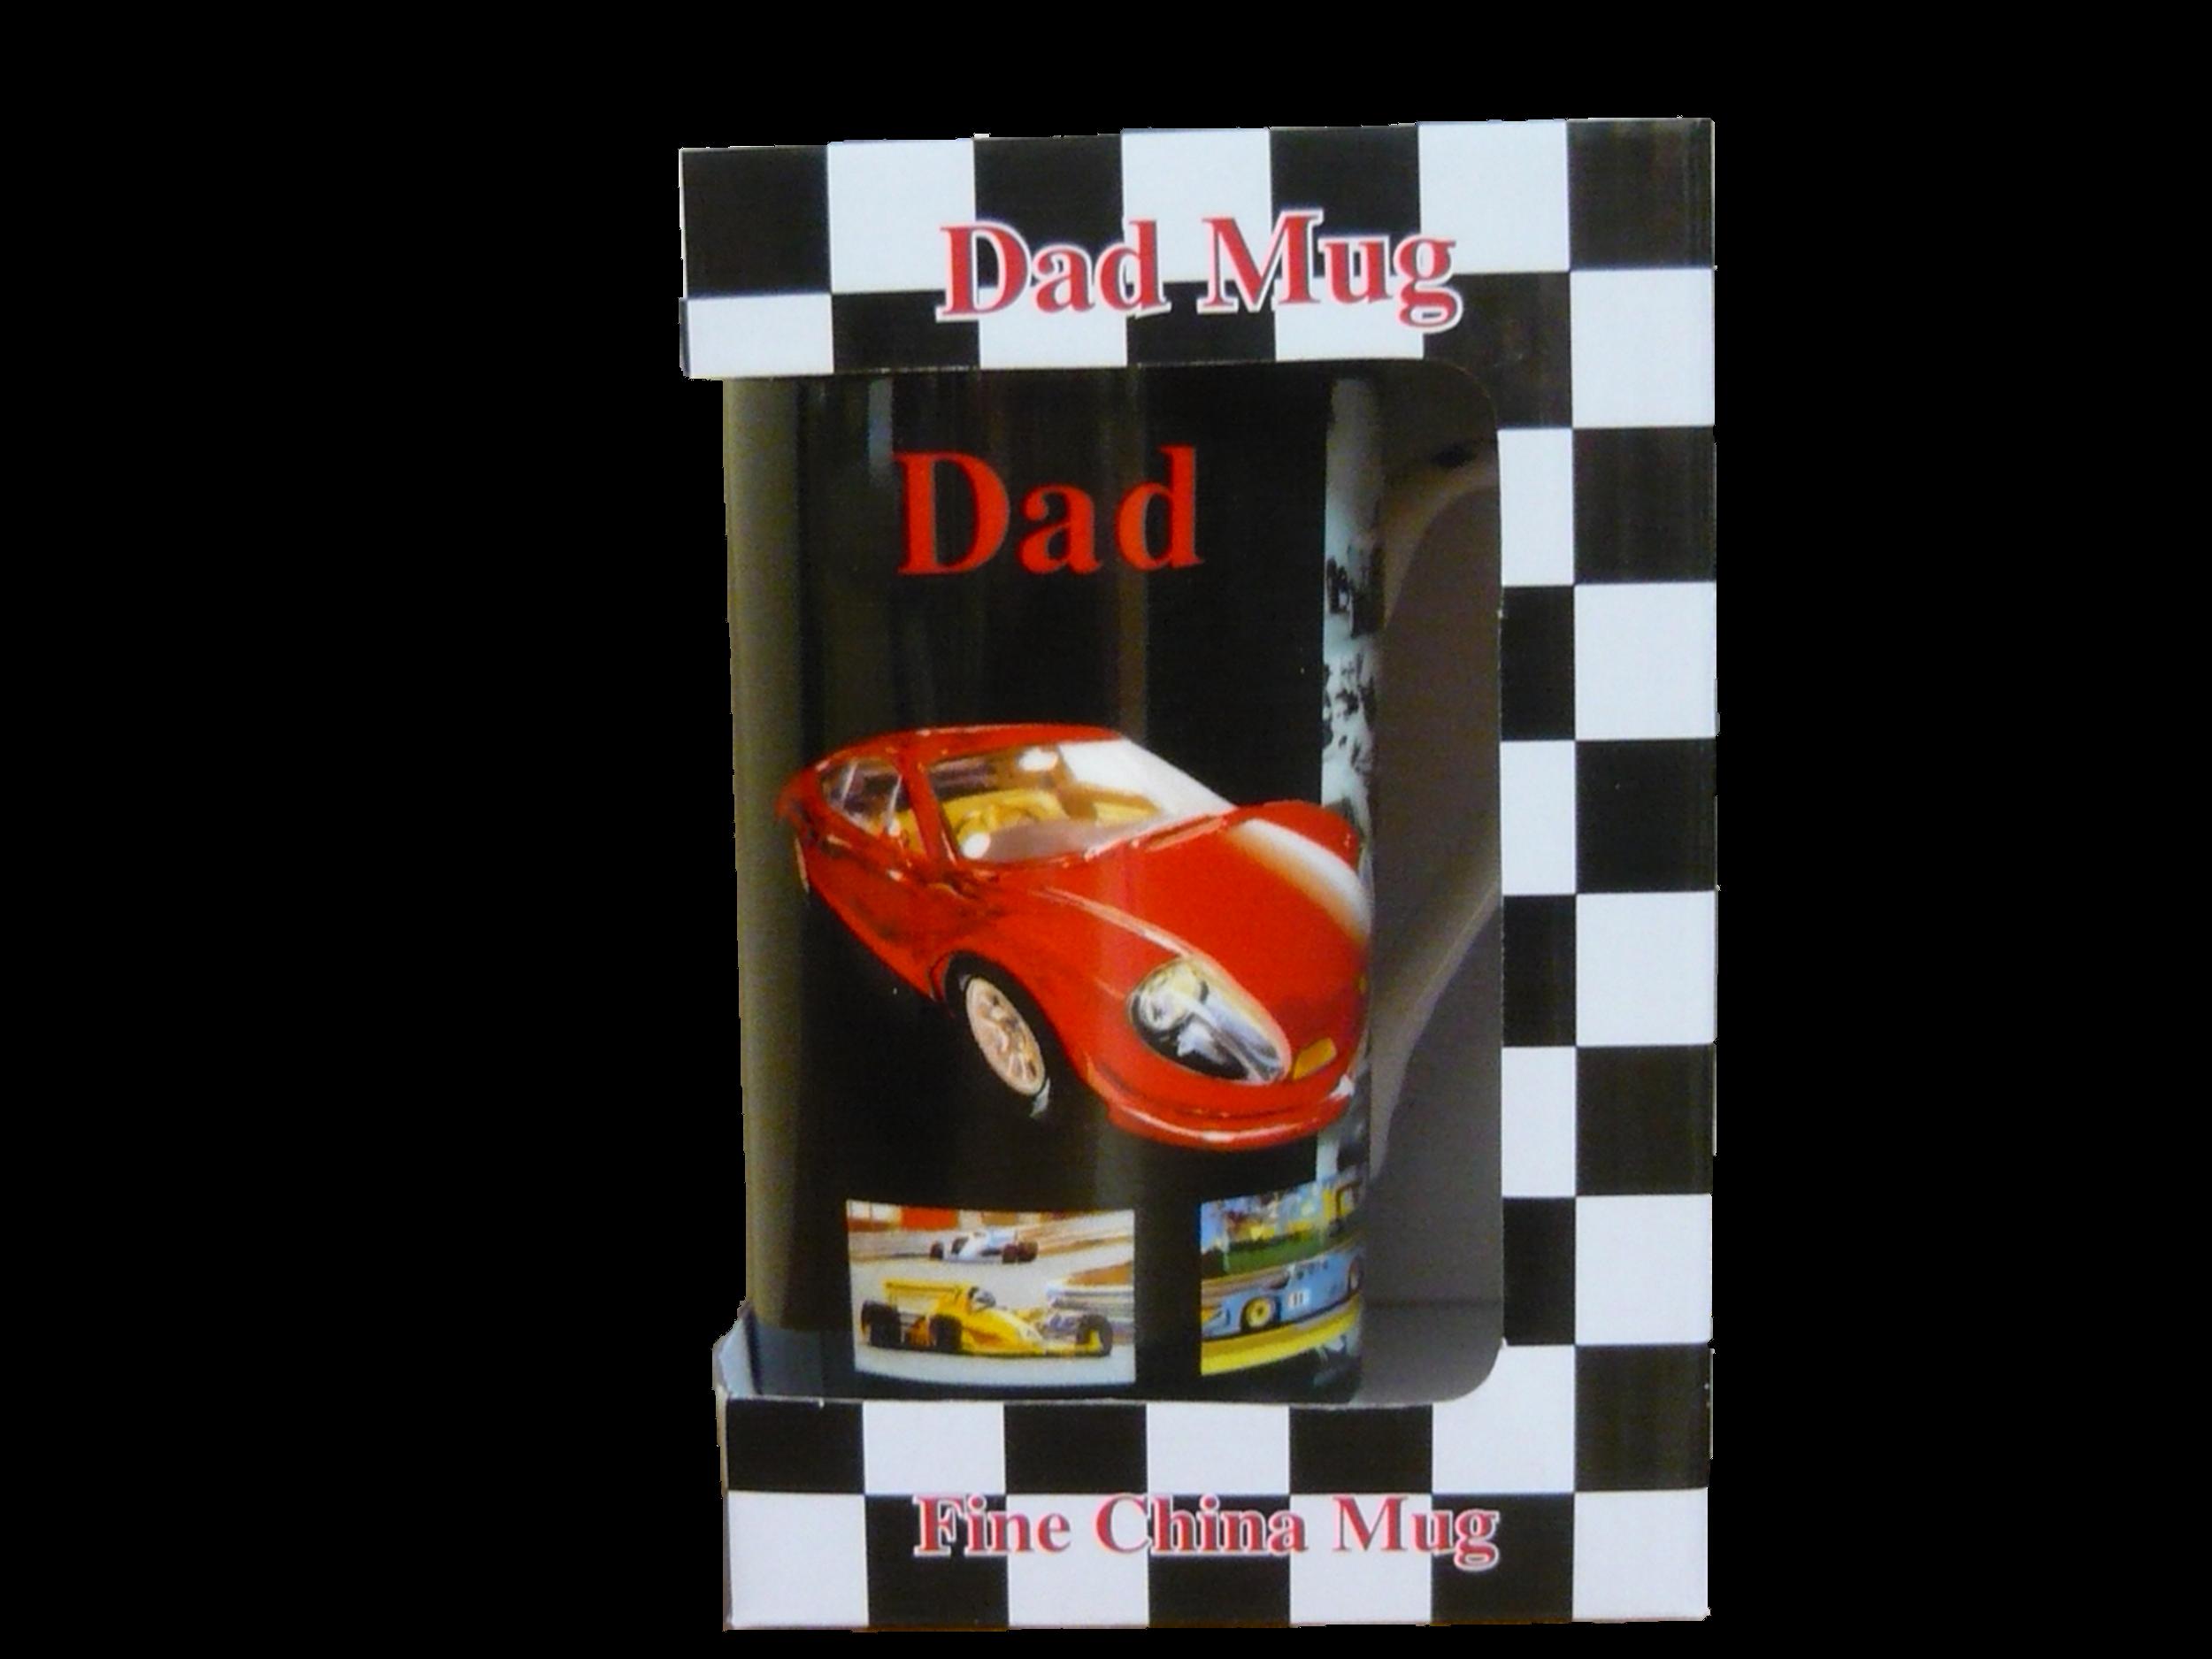 Dad Mug (Red and Black)